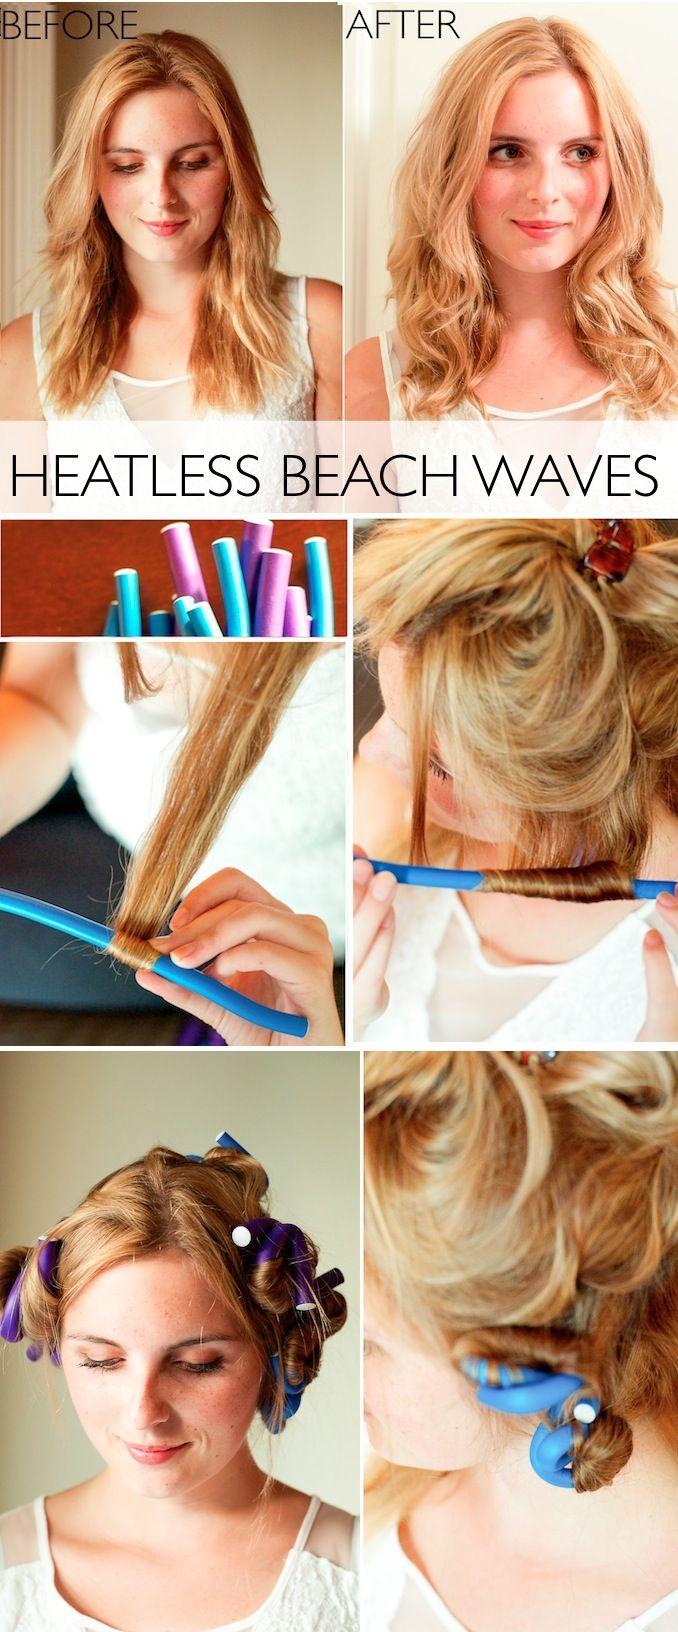 Beauty Hacks Ideas : Super Easy Heatless Curls Tutorial! #Hacks https://inwomens.com/2018/03/08/beauty-hacks-ideas-super-easy-heatless-curls-tutorial/